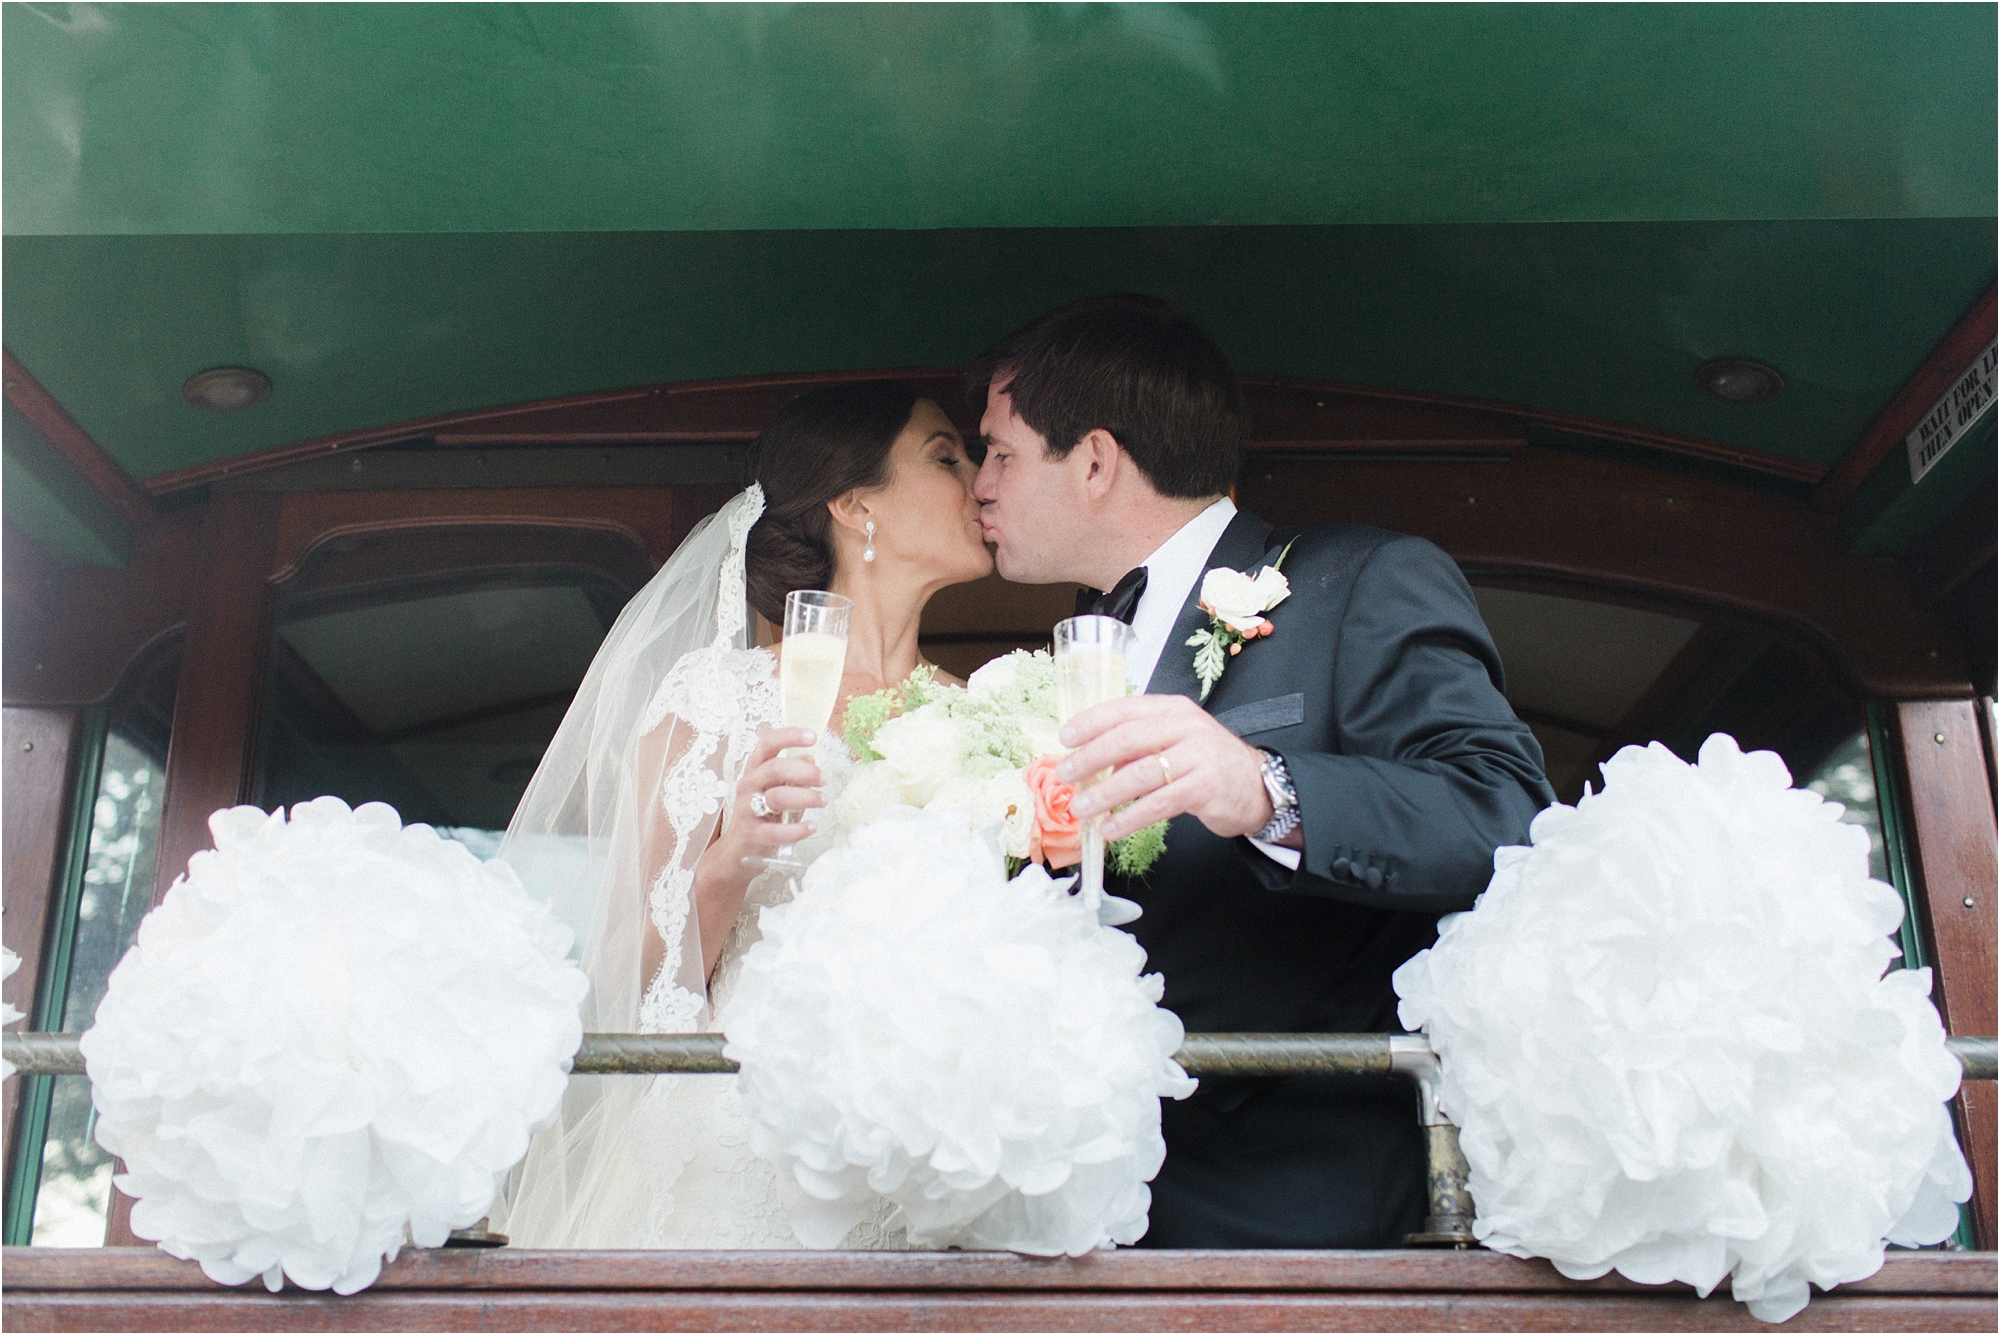 stephanie-yonce-photography-richmond-virginia-country-club-wedding-photo_029.JPG